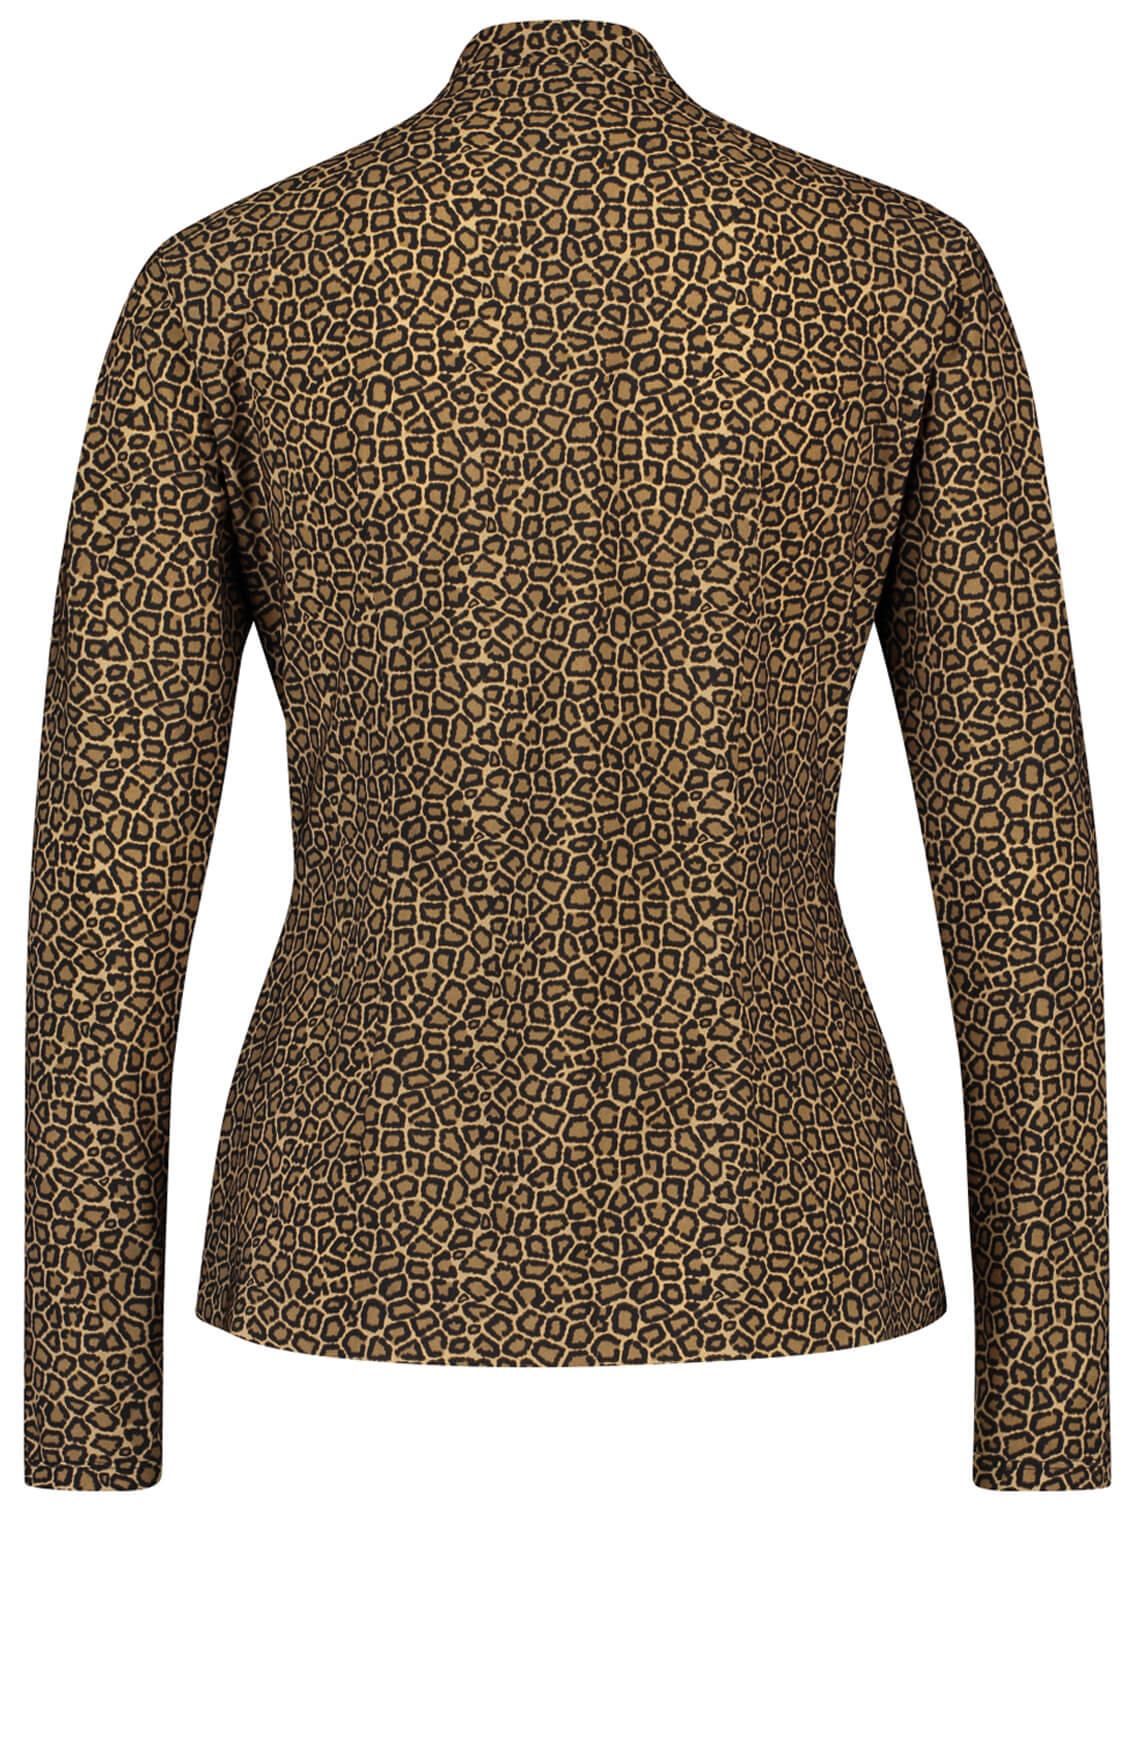 Jane Lushka Dames Panterprint blouse Bruin